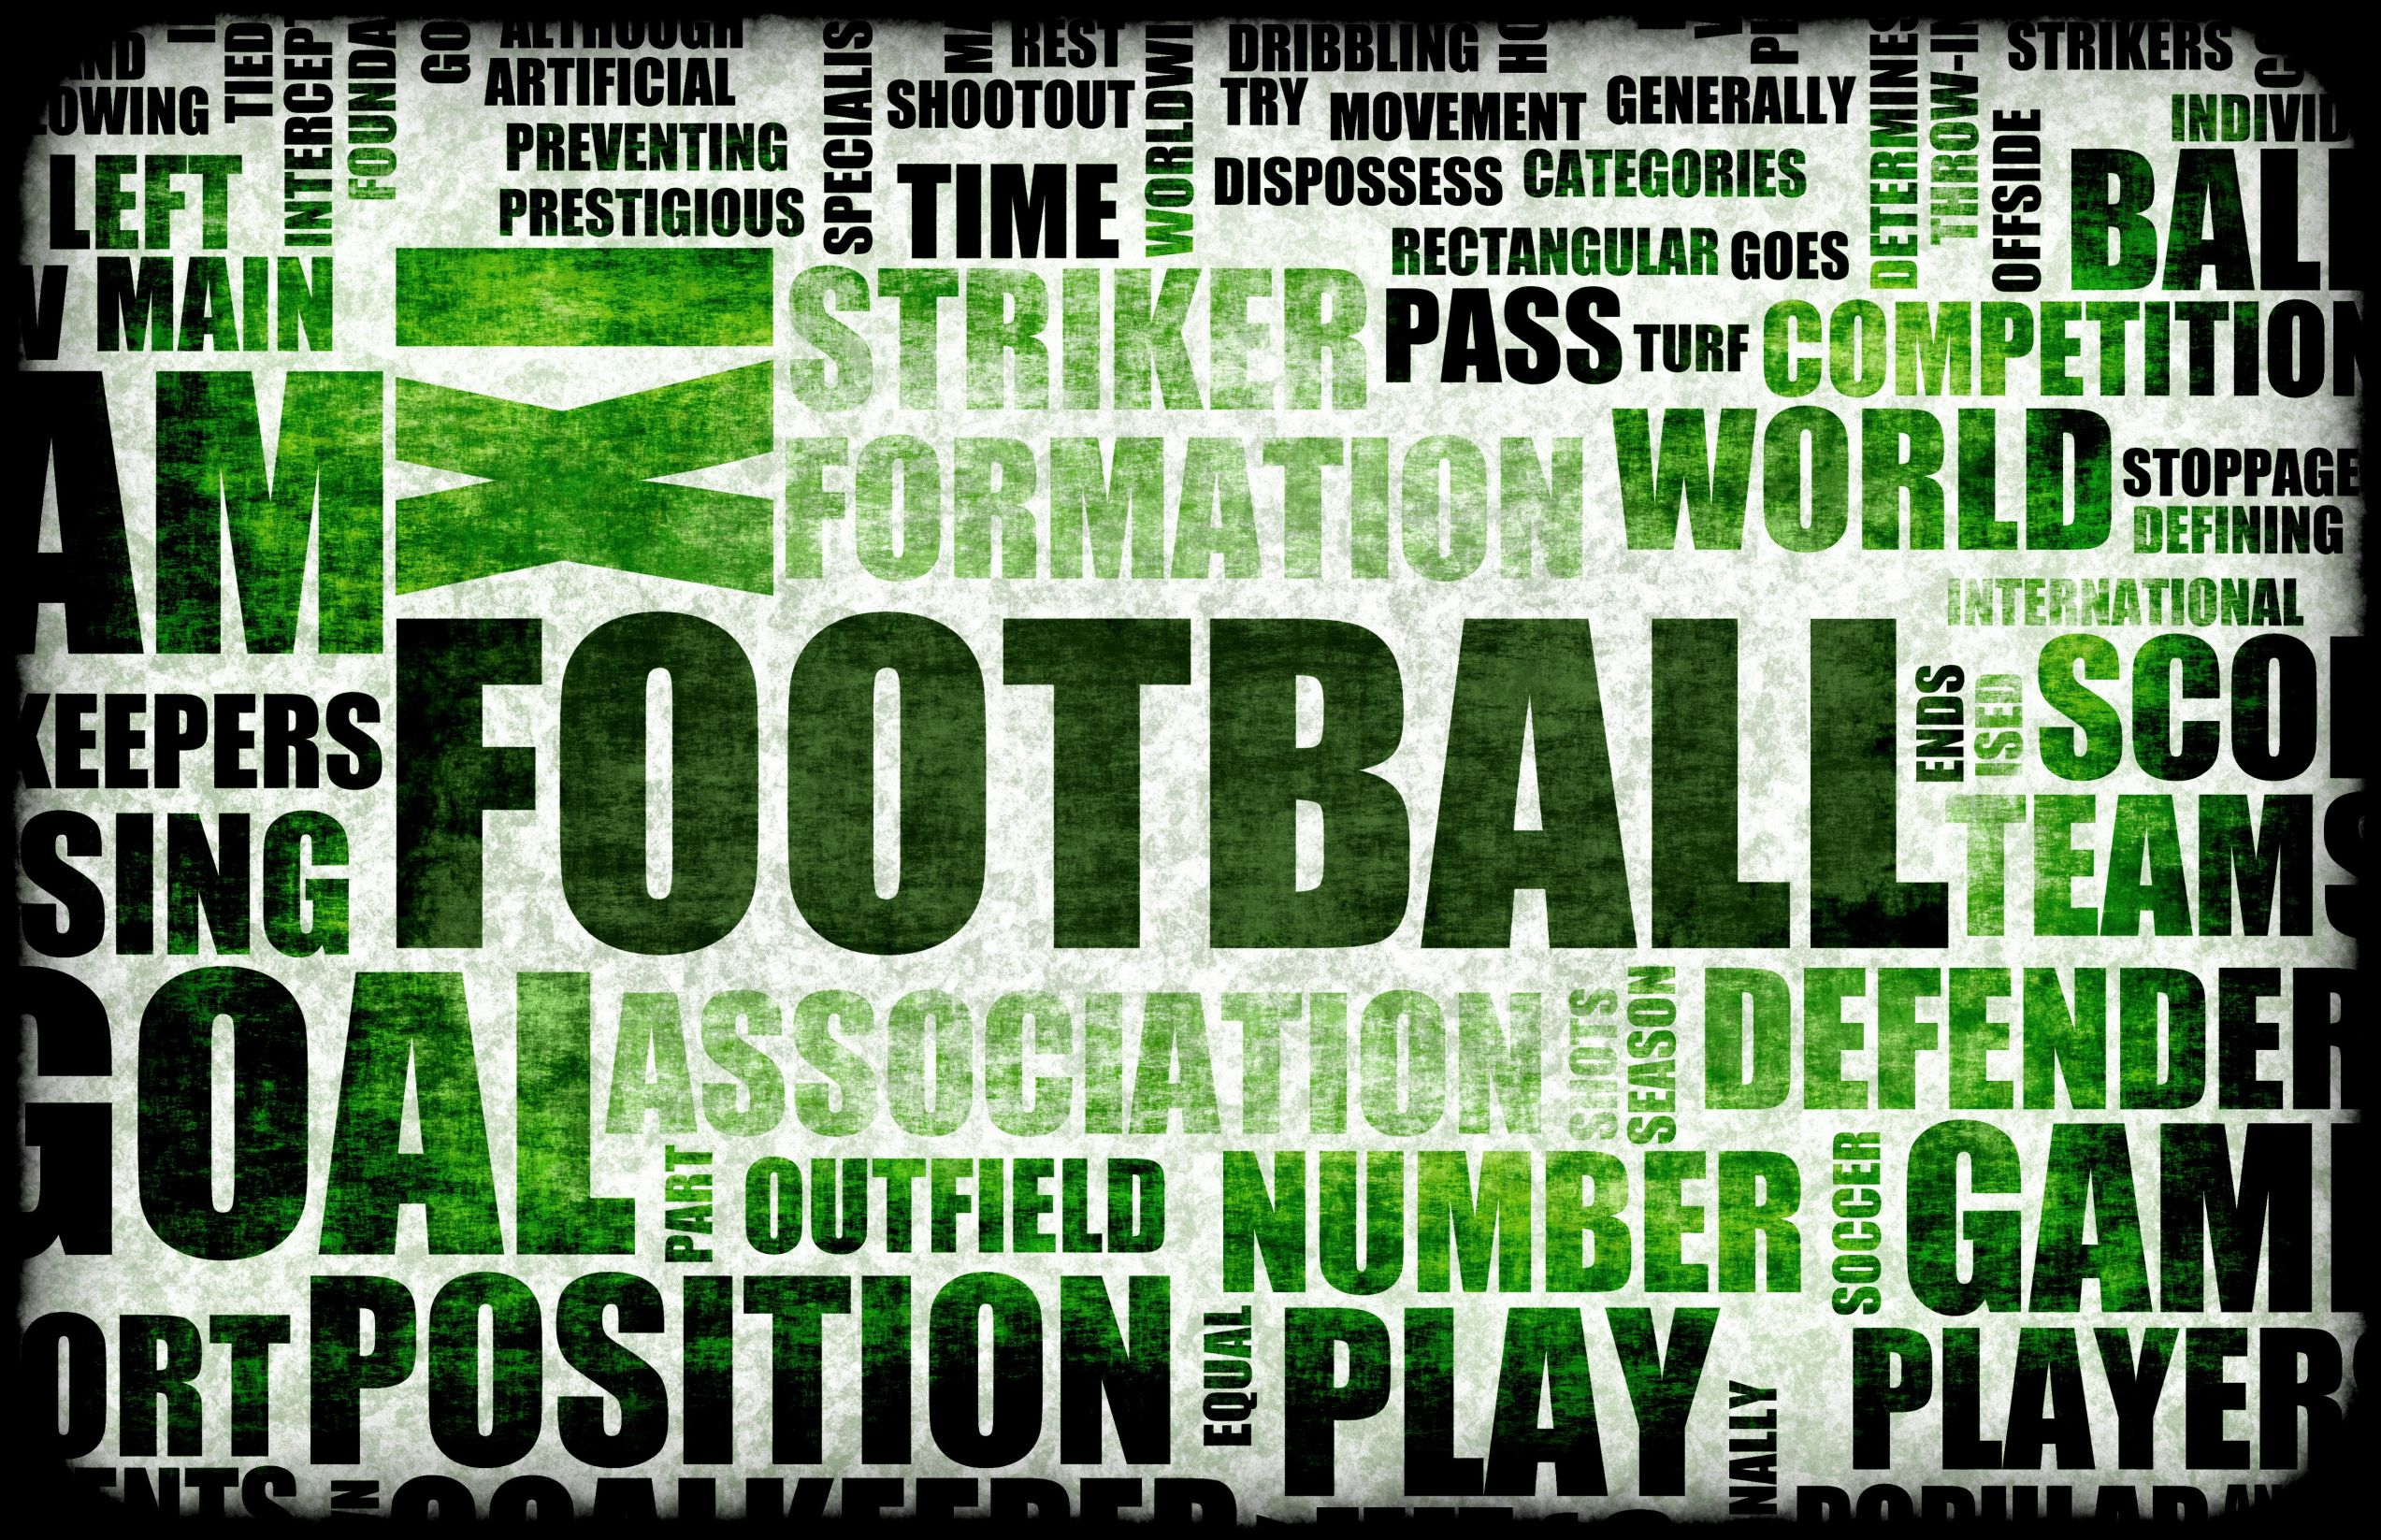 Football Glossary: Step over